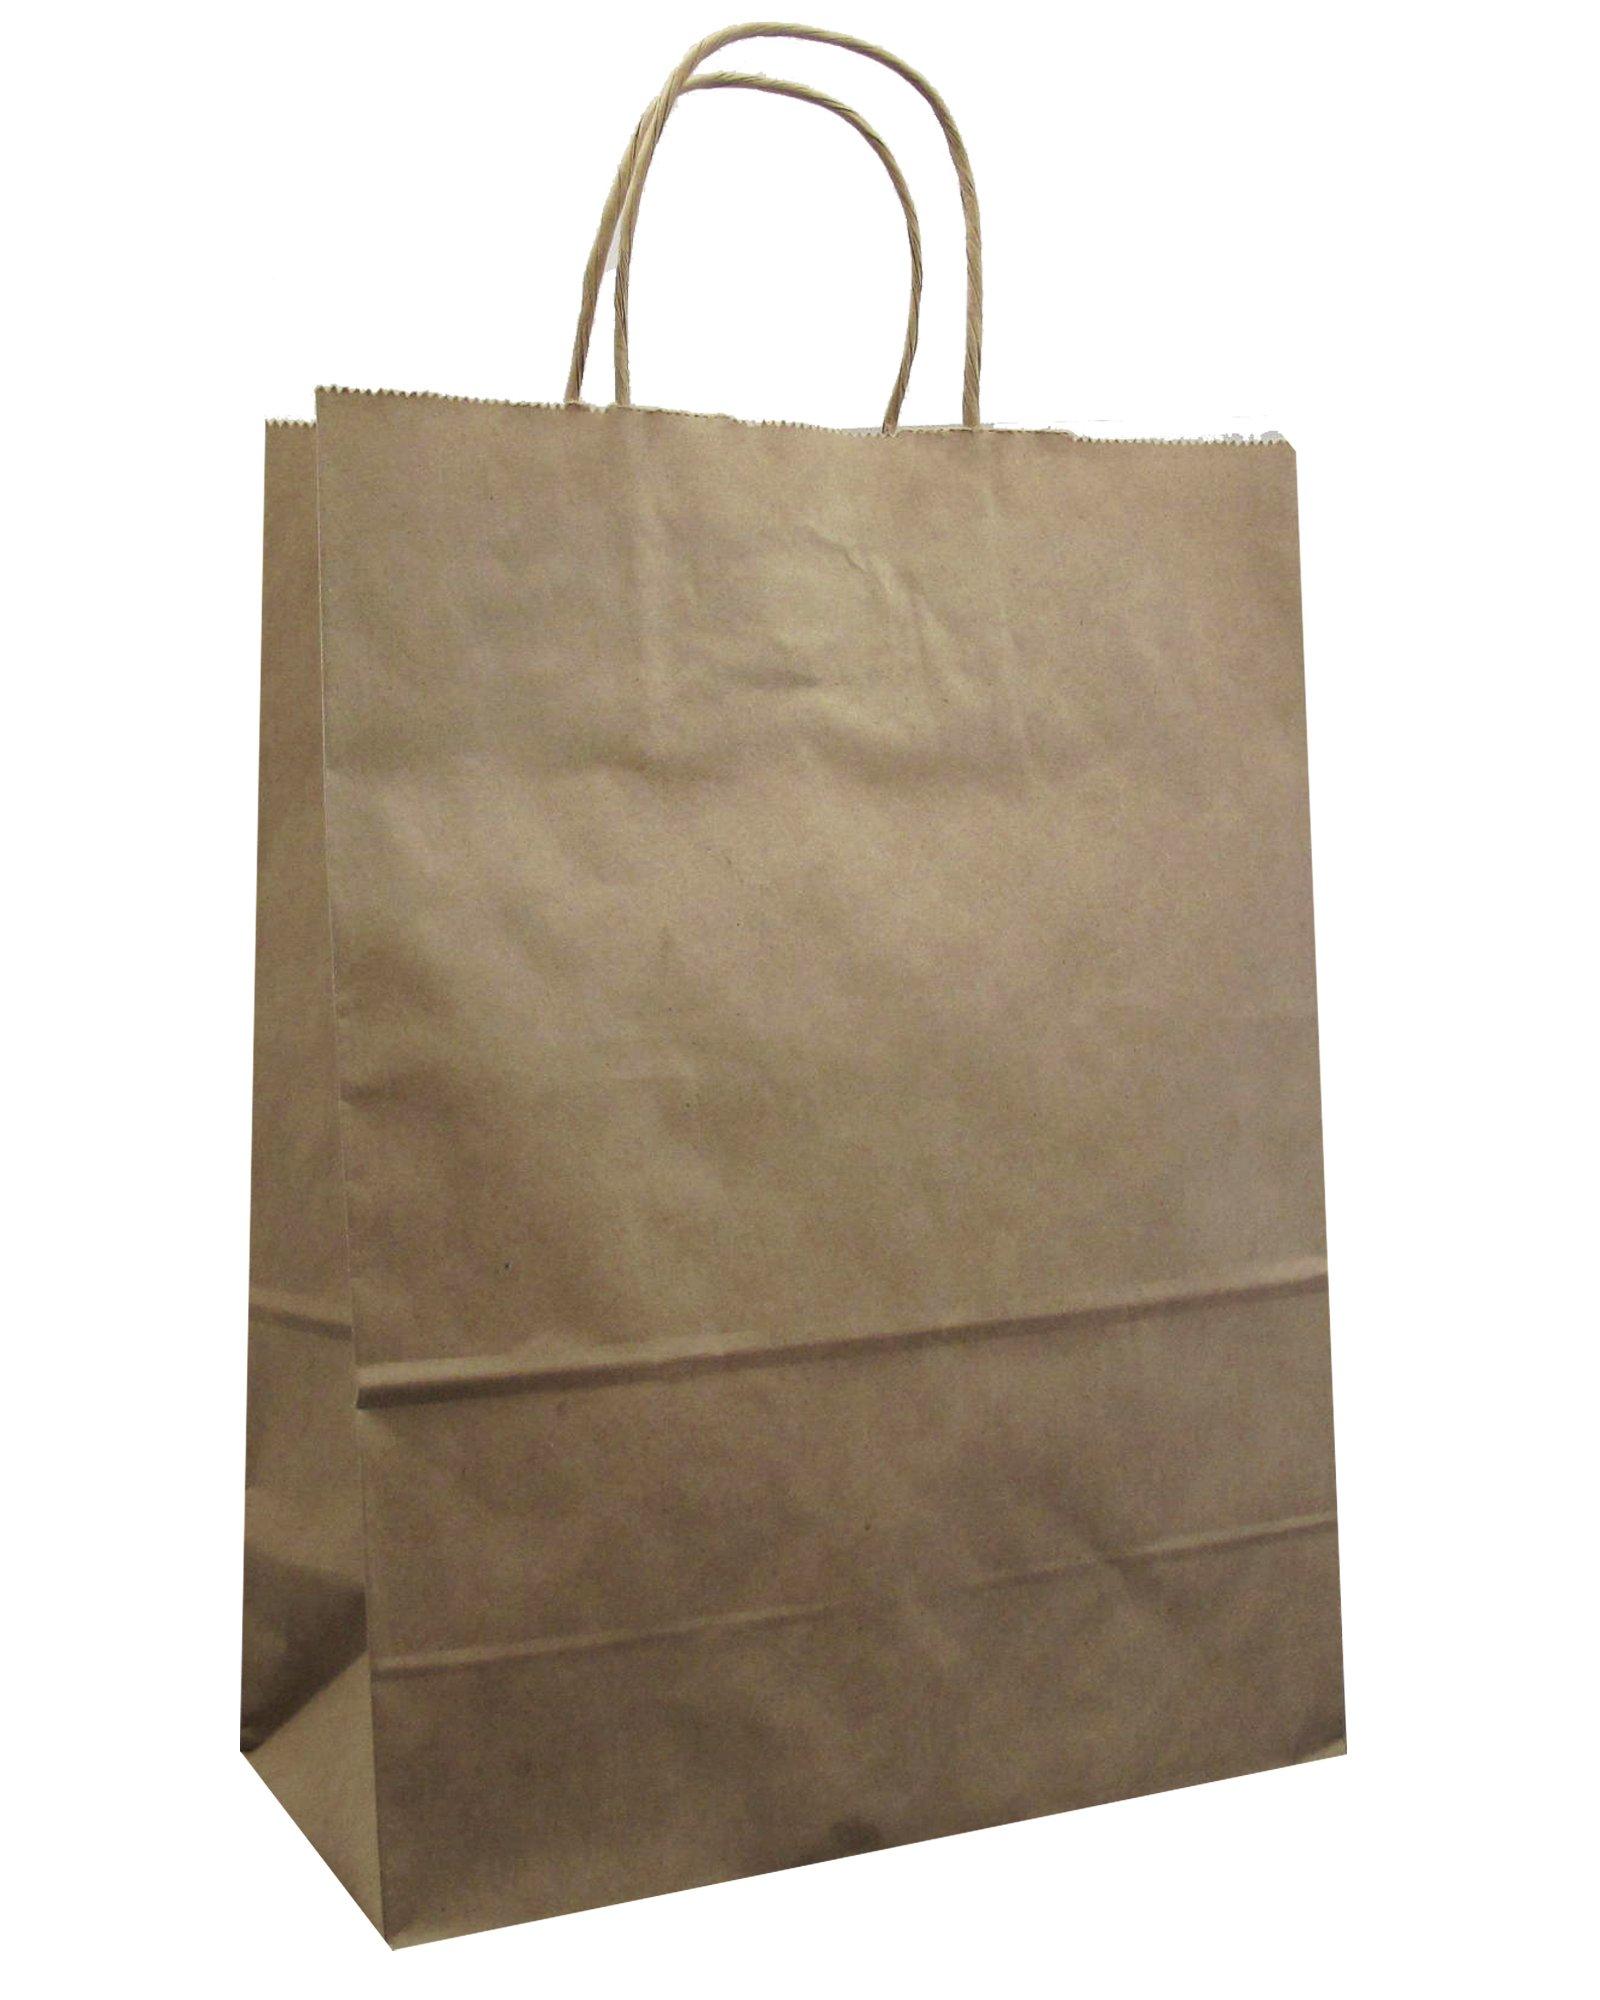 Jillson Roberts Bulk Medium Recycled Kraft Bags Available in 13 Colors, Natural, 250-Count (BMK918) by Jillson Roberts (Image #2)